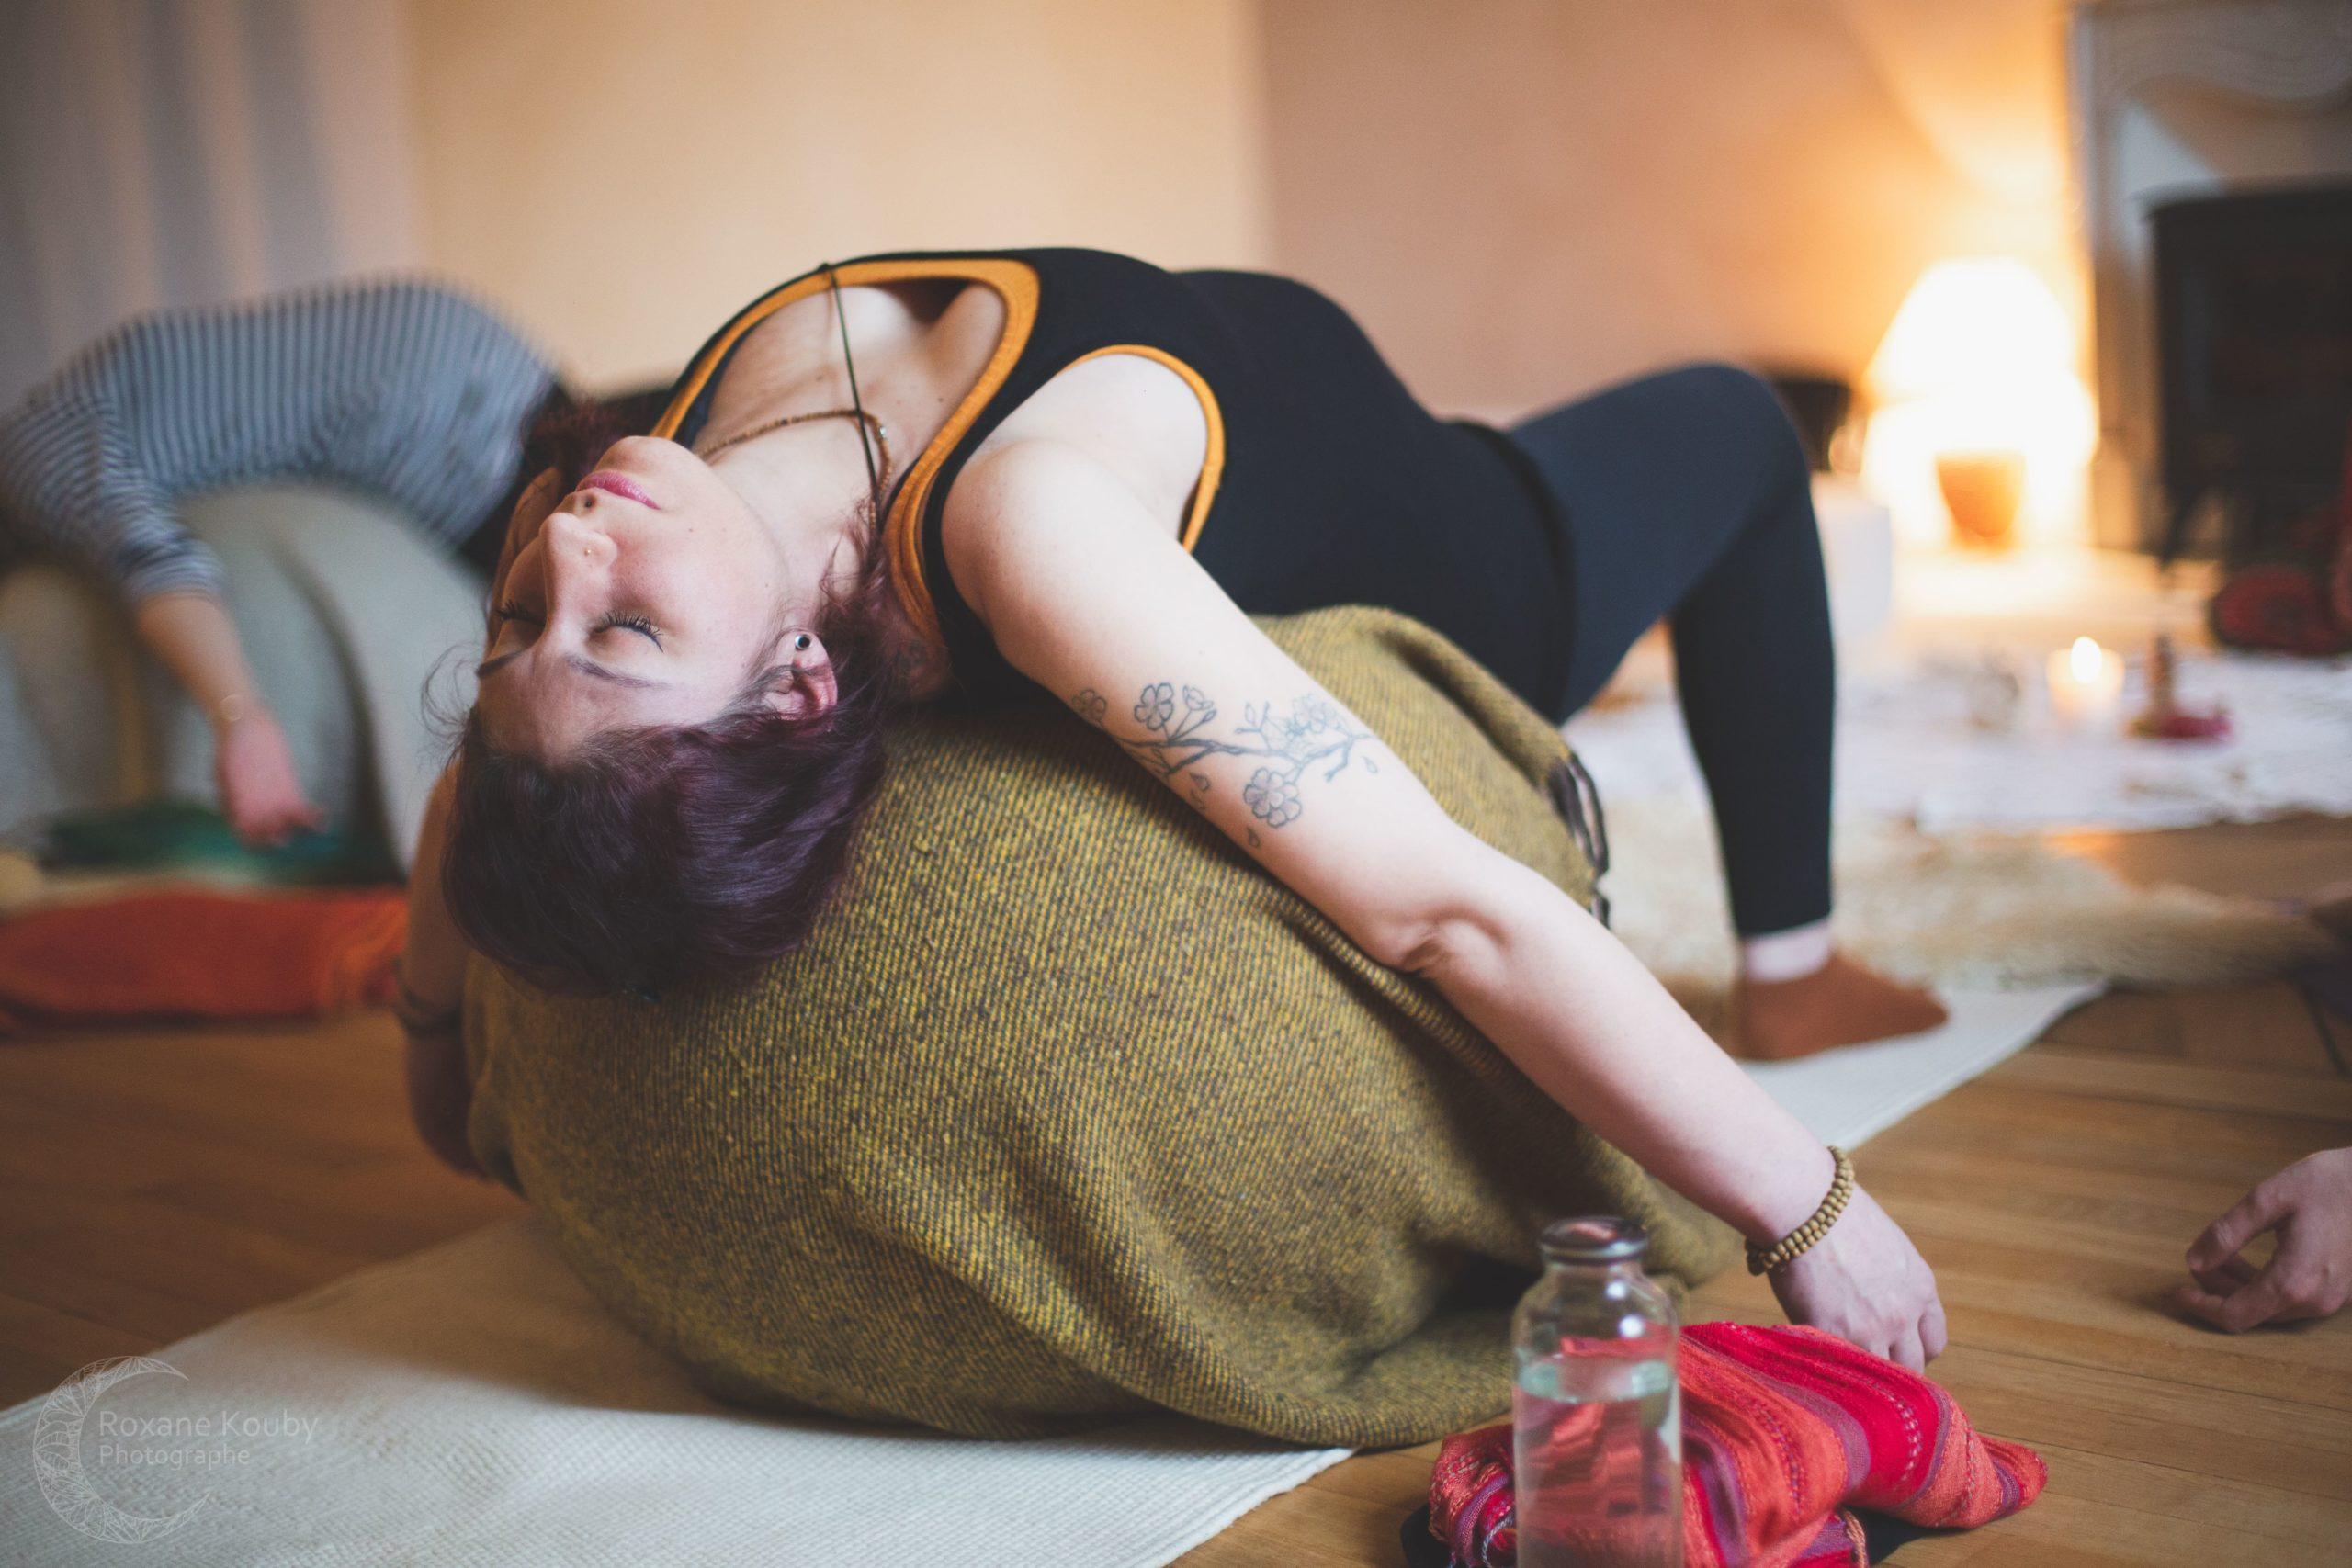 Yoga_maternité_06_03_2020@roxane kouby-8-min